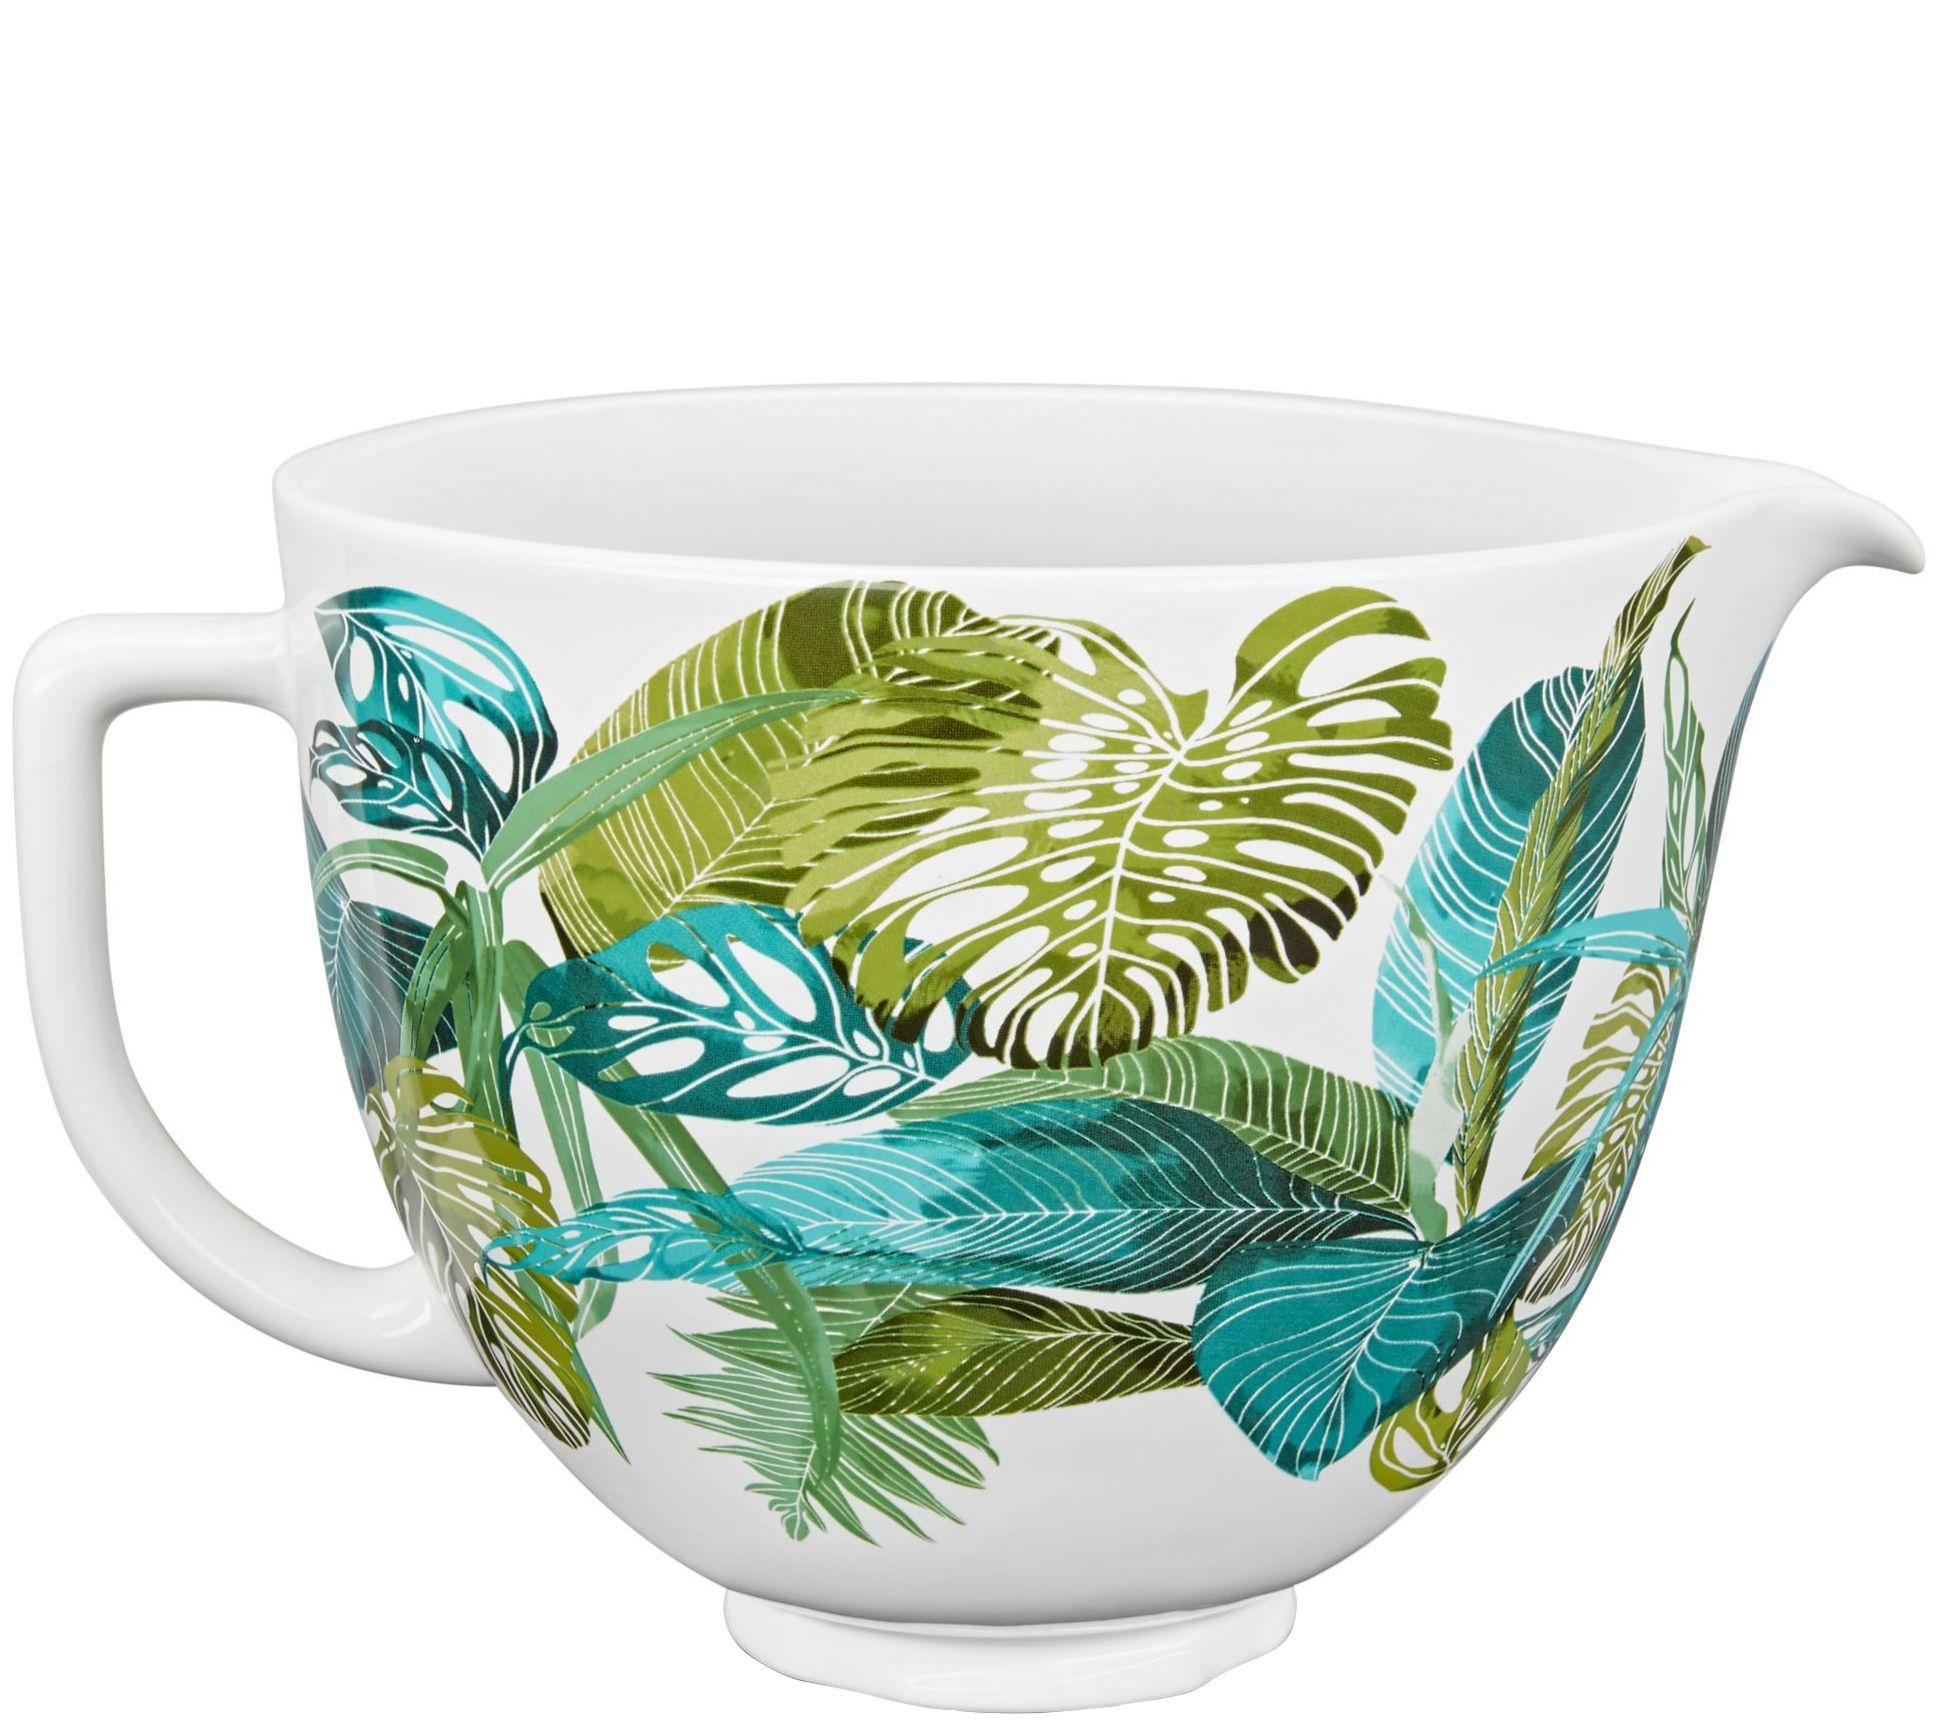 Kitchenaid 5quart ceramic patterned bowl tropical floral